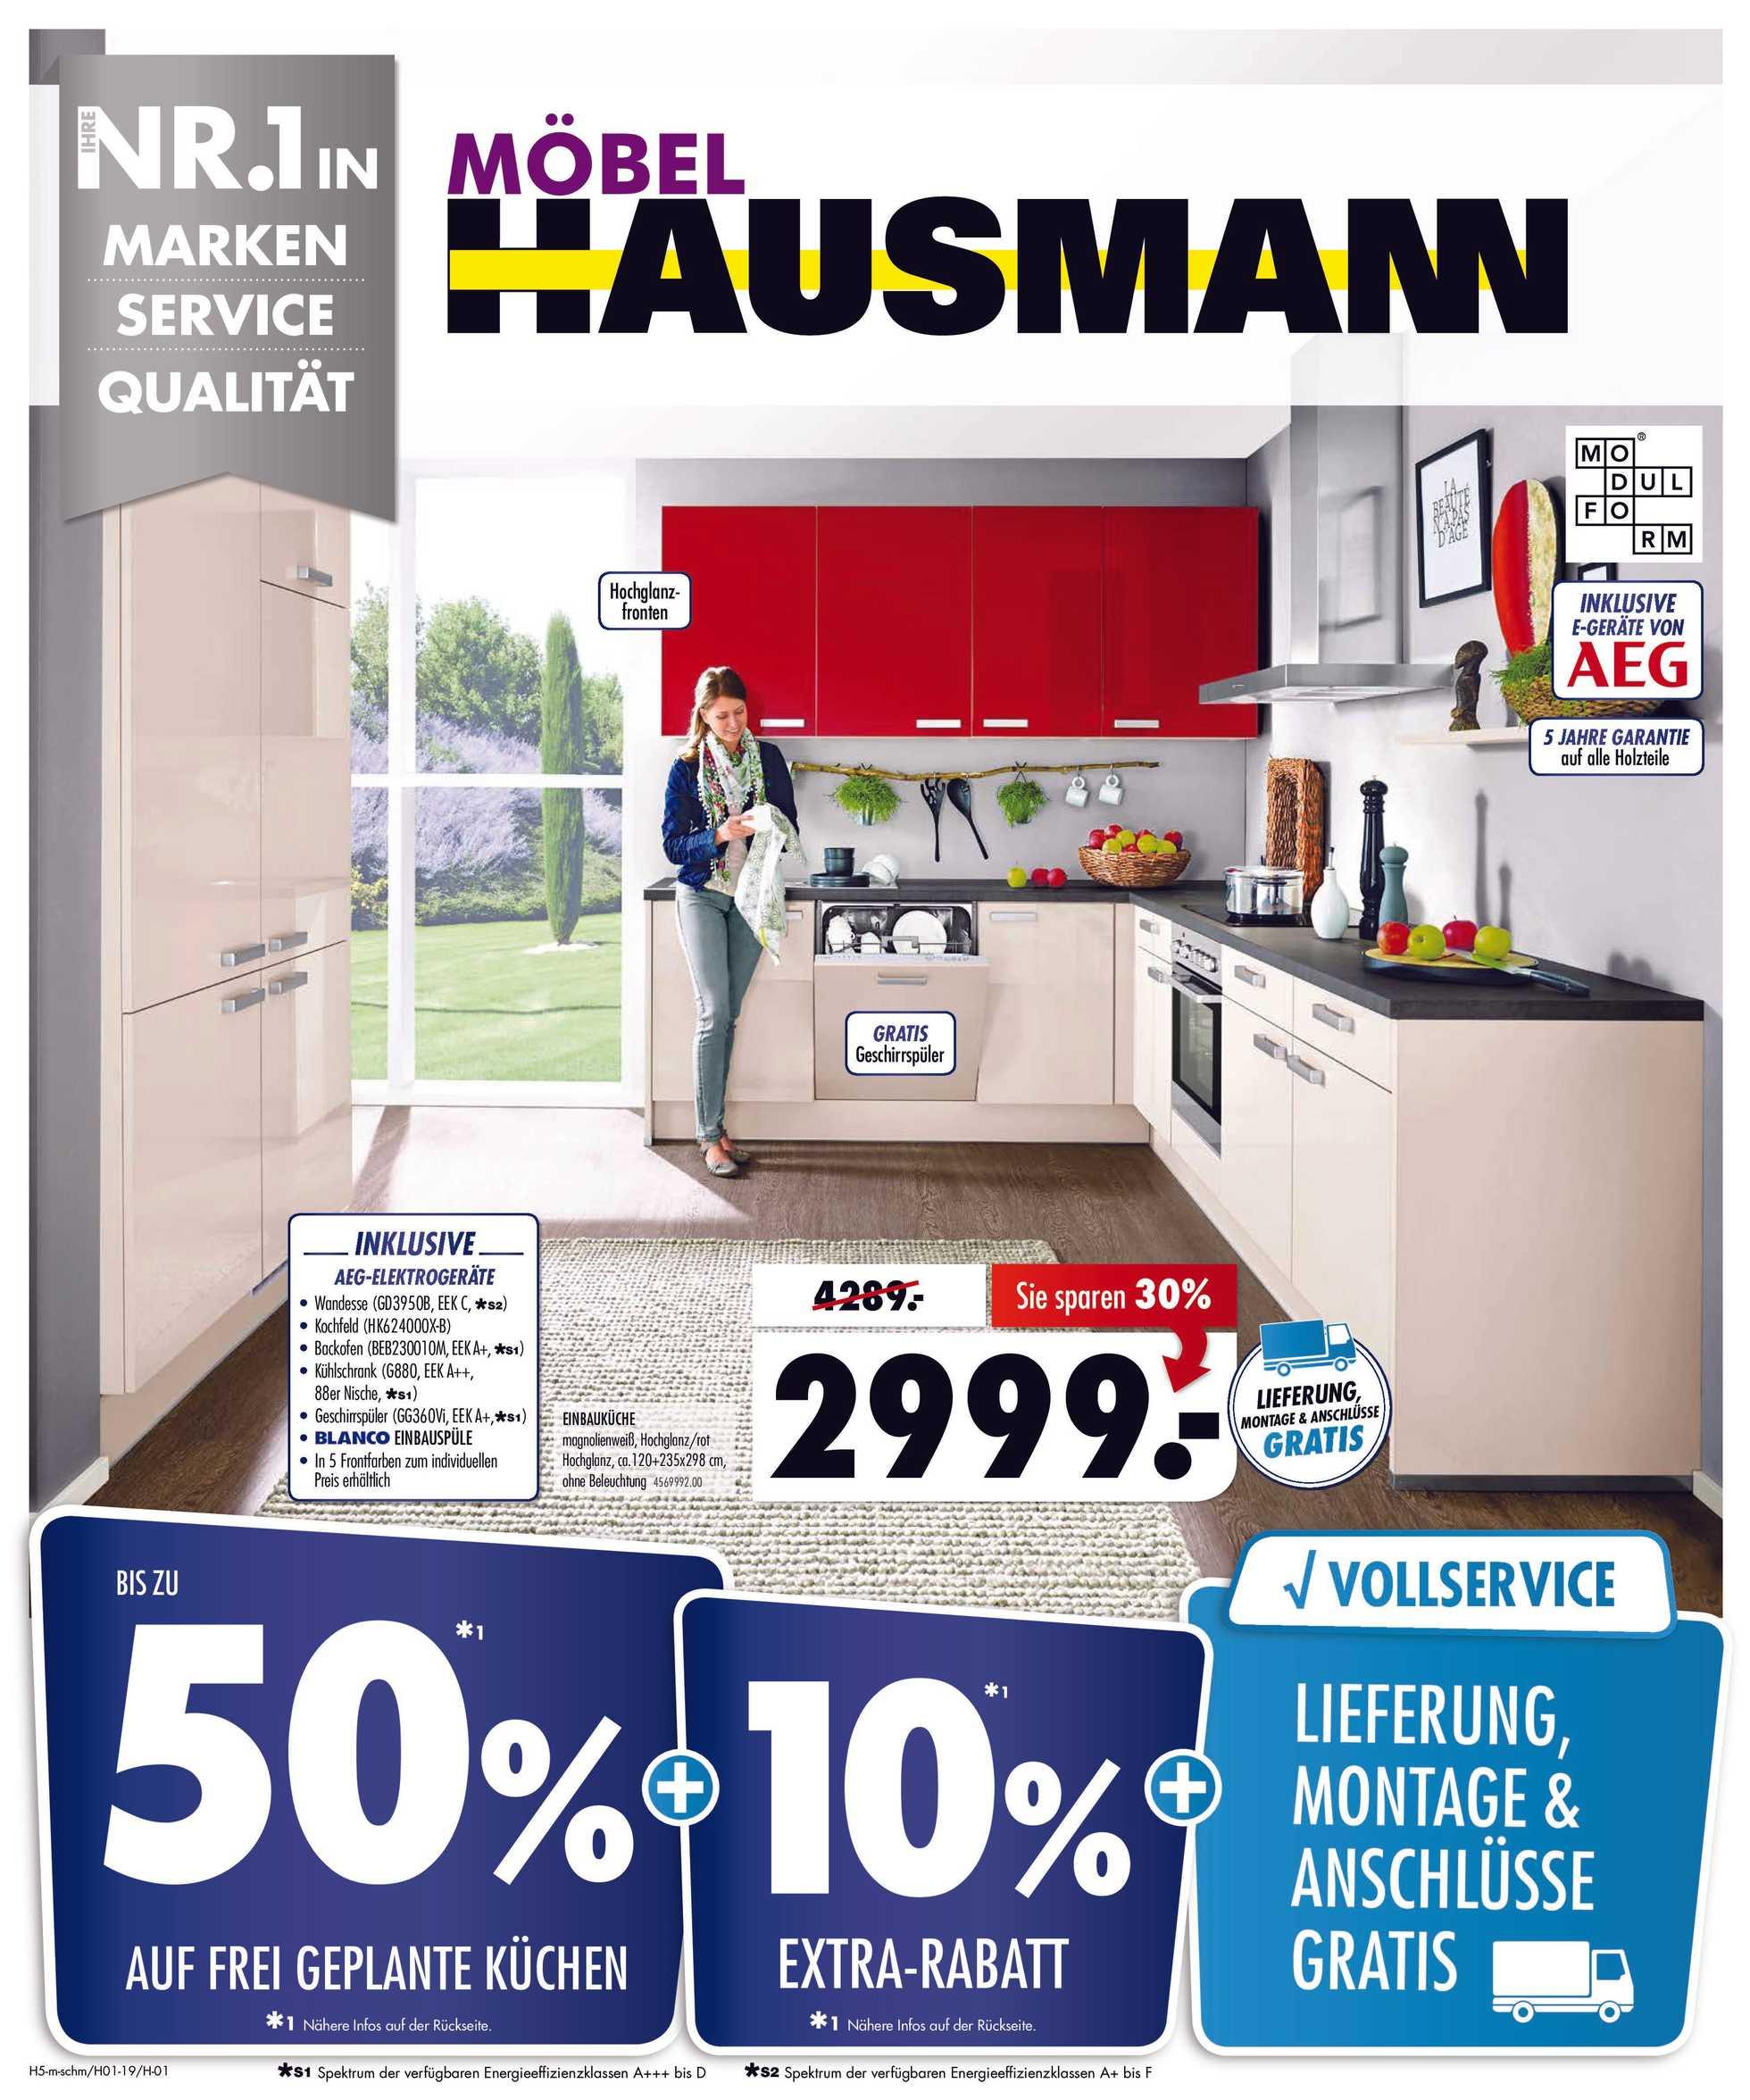 Möbel Hausmann - NEWSPAPERS_singleNewspaper_alt_presentationSliderItem_startAt 2019-01-22 - seite 1